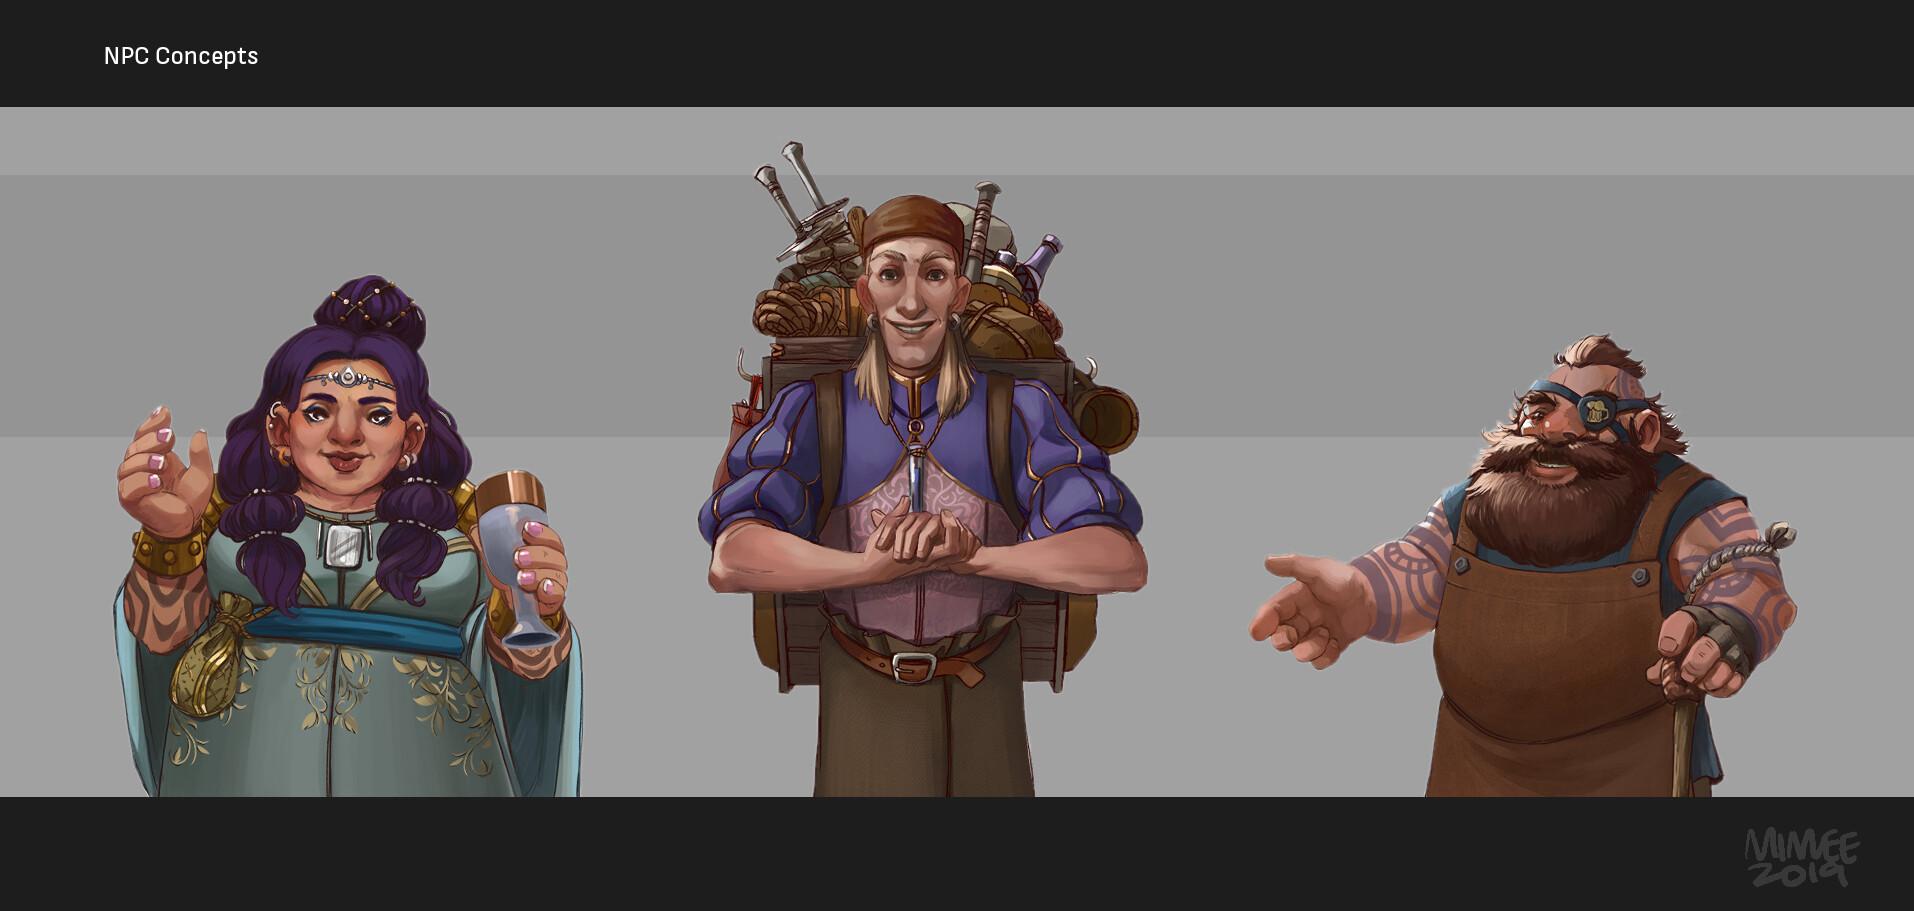 A noble, a merchant, and an innkeeper.